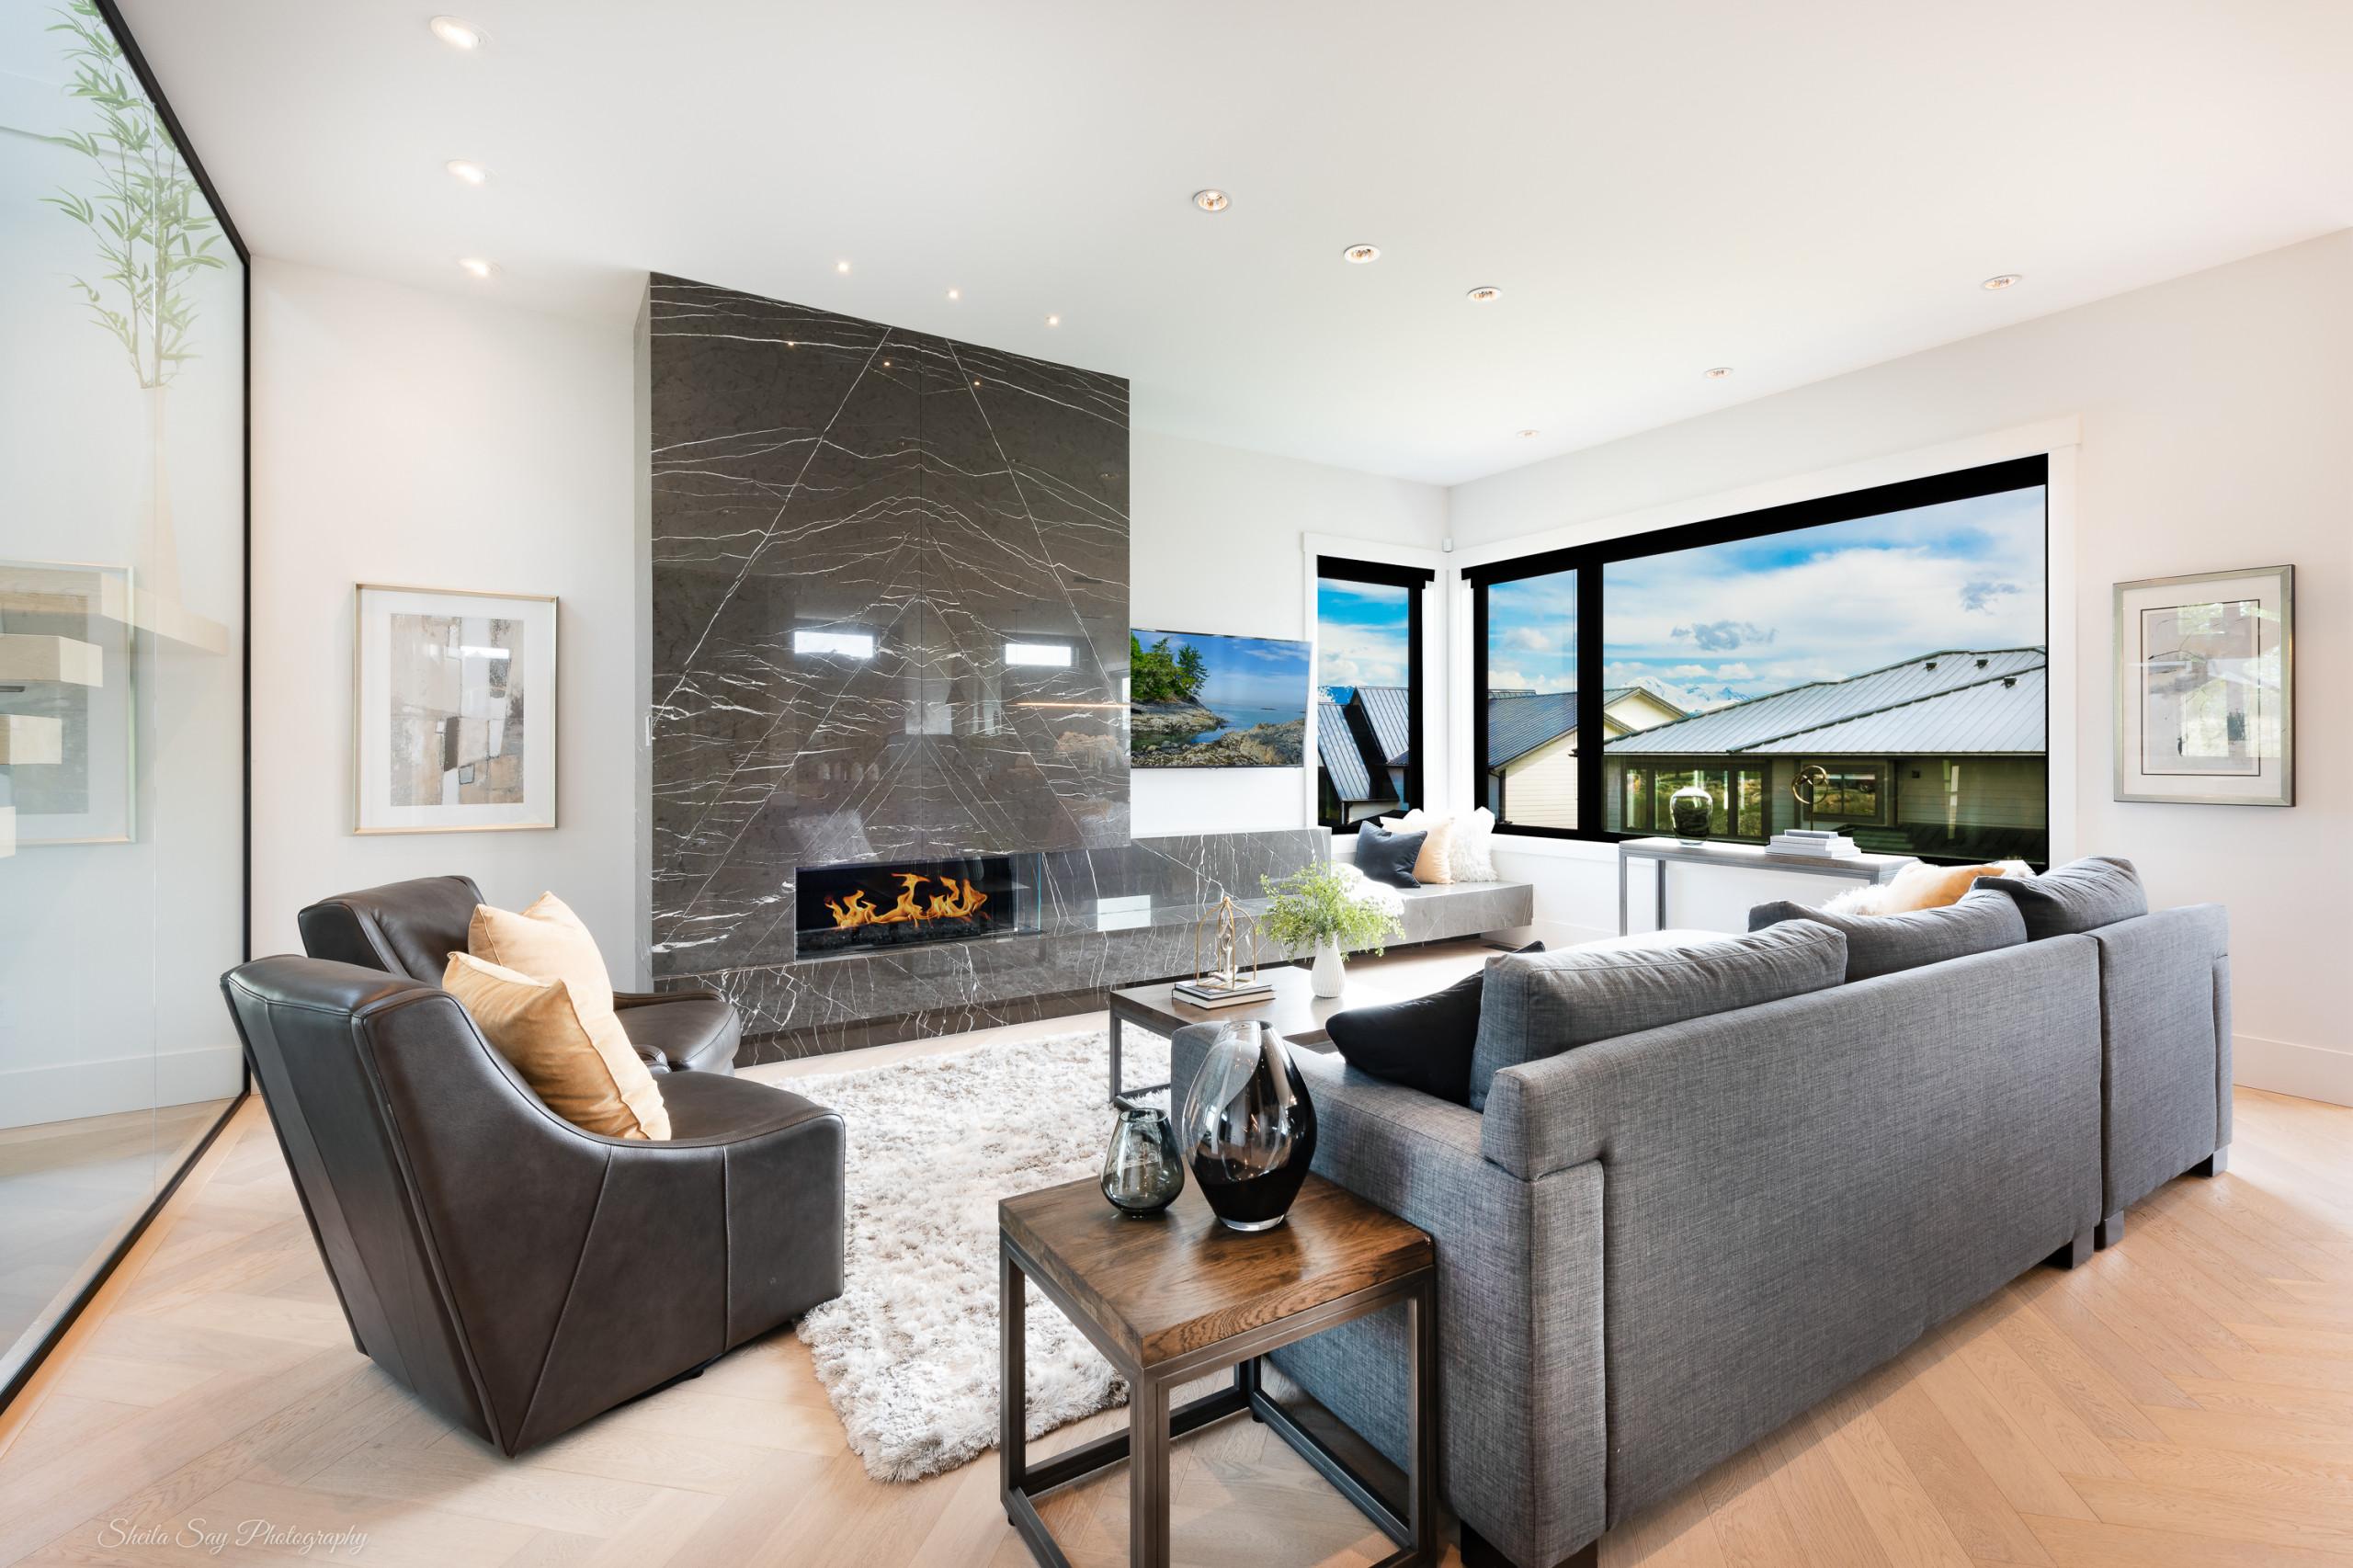 Millionaire Lottery Home - Eagle Mountain, Abbotsford